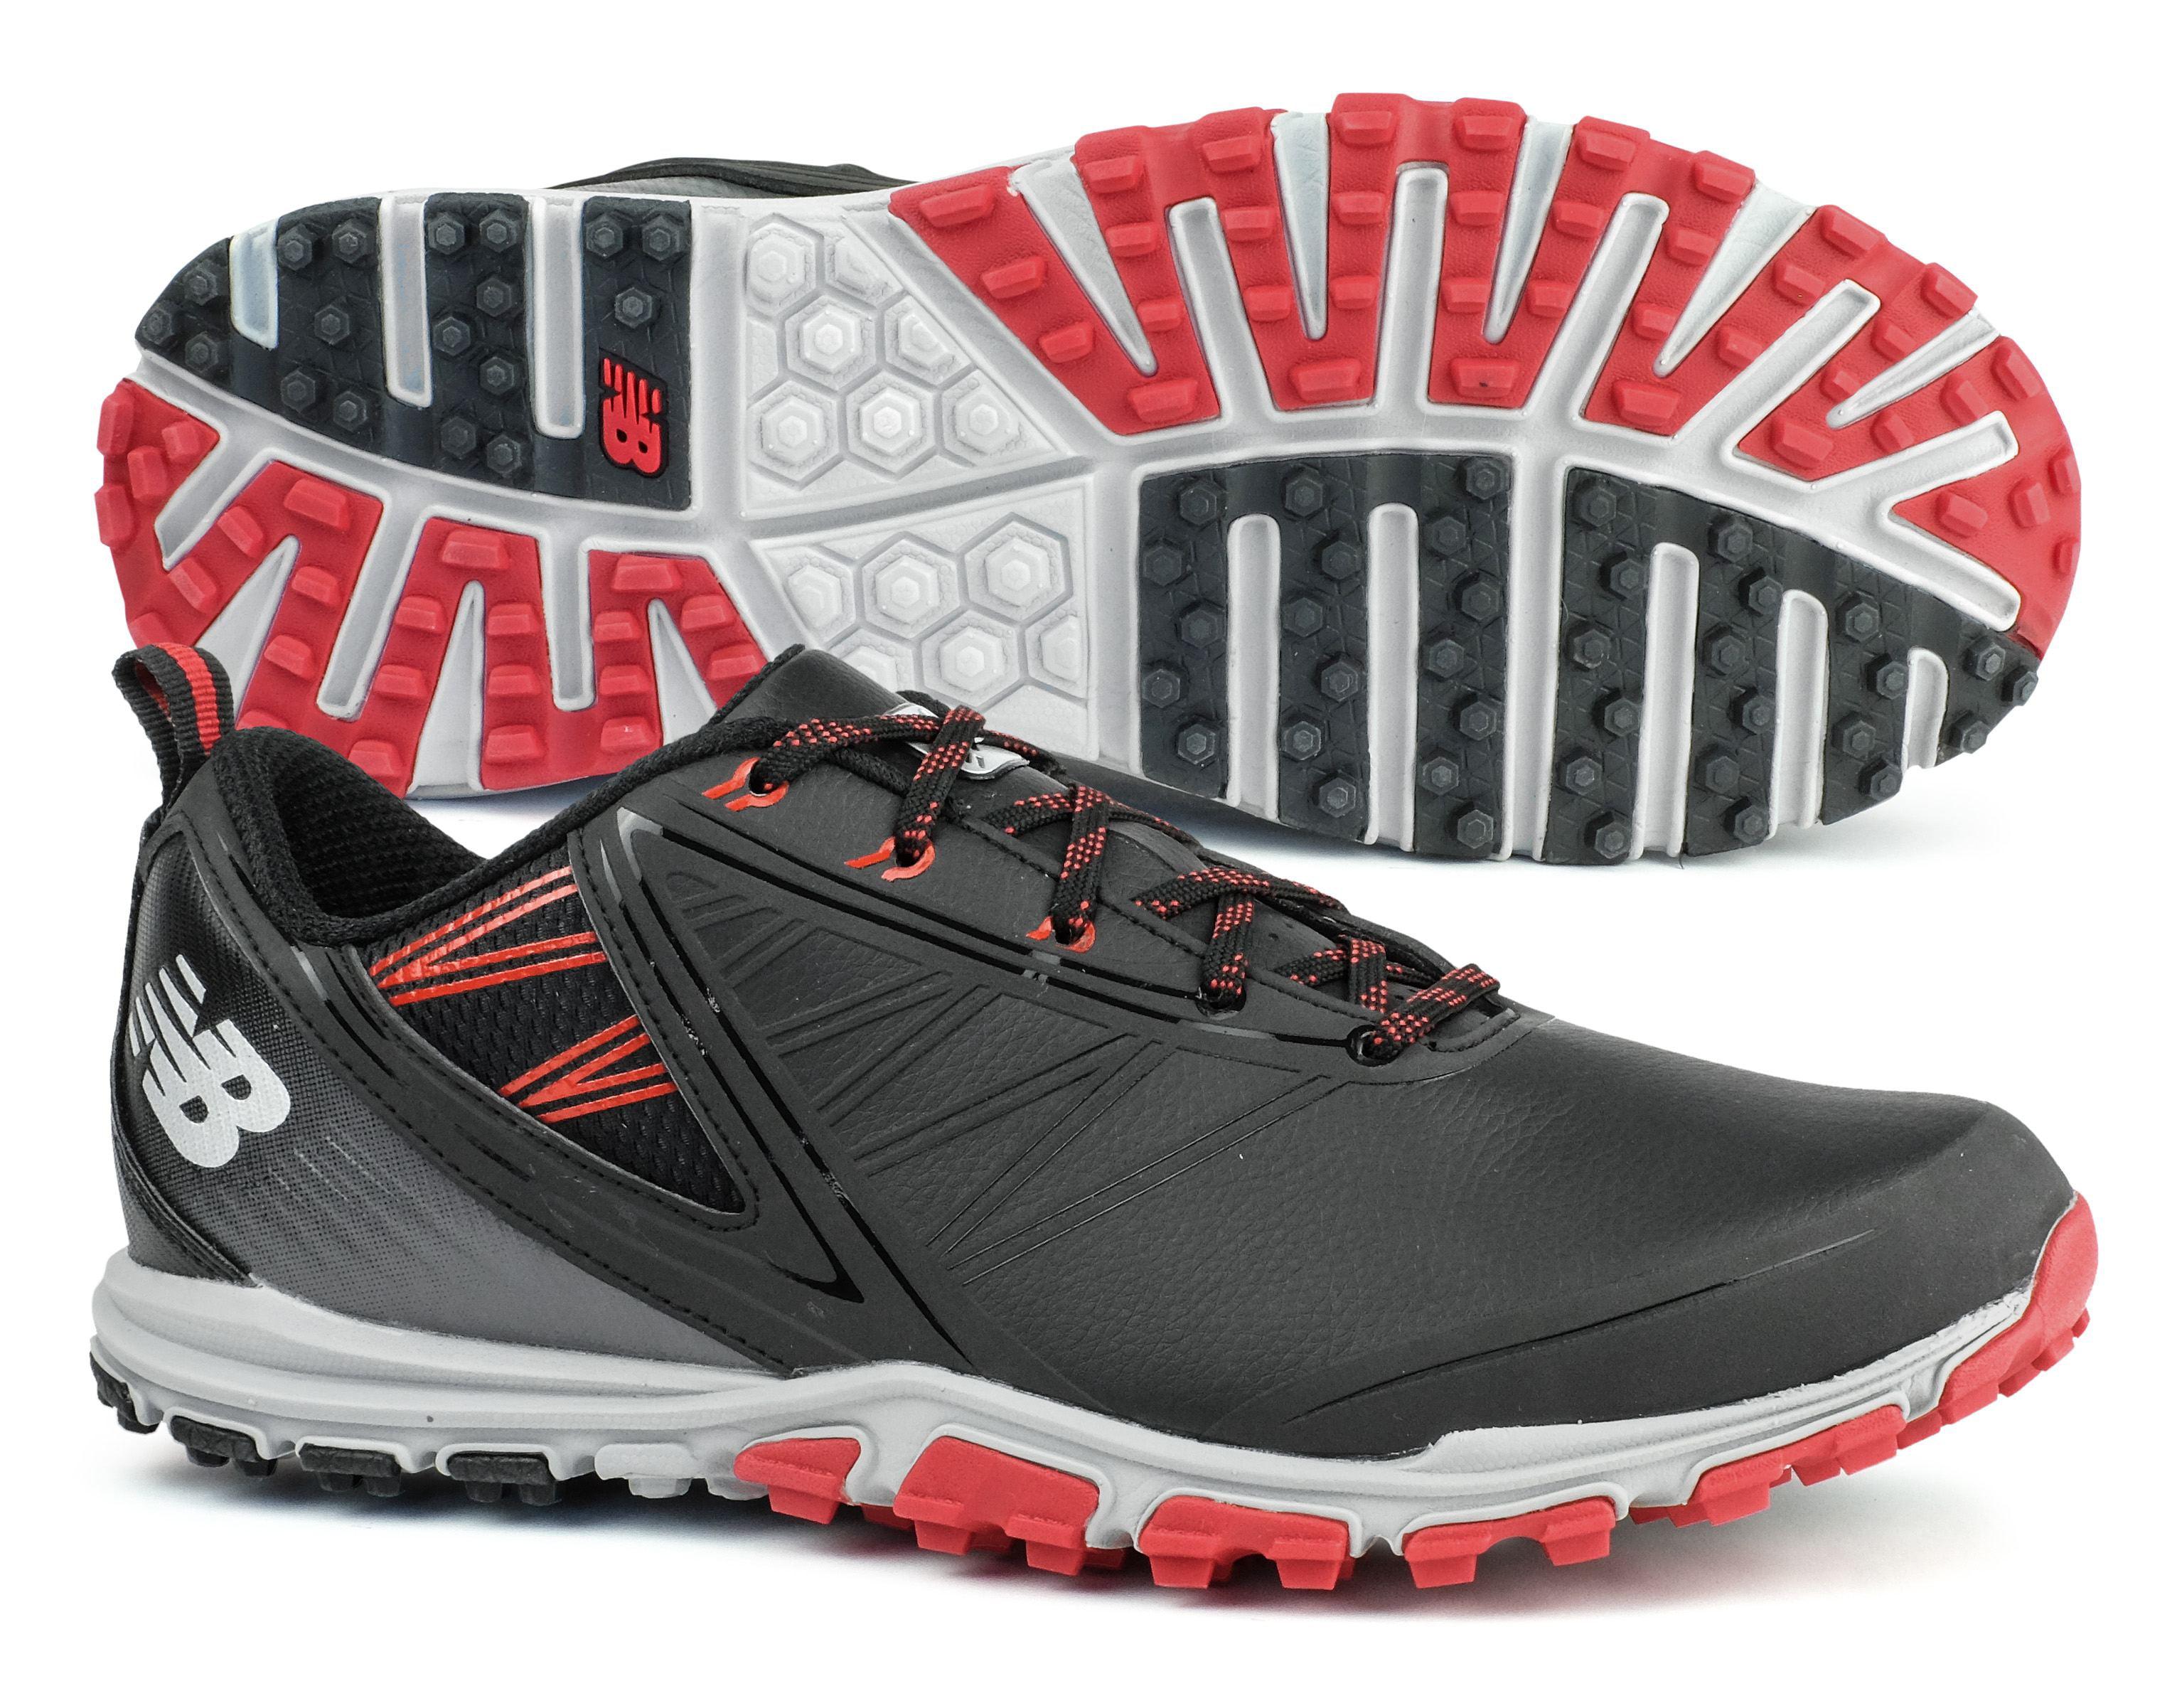 New Balance Golf- Minimus SL Shoes